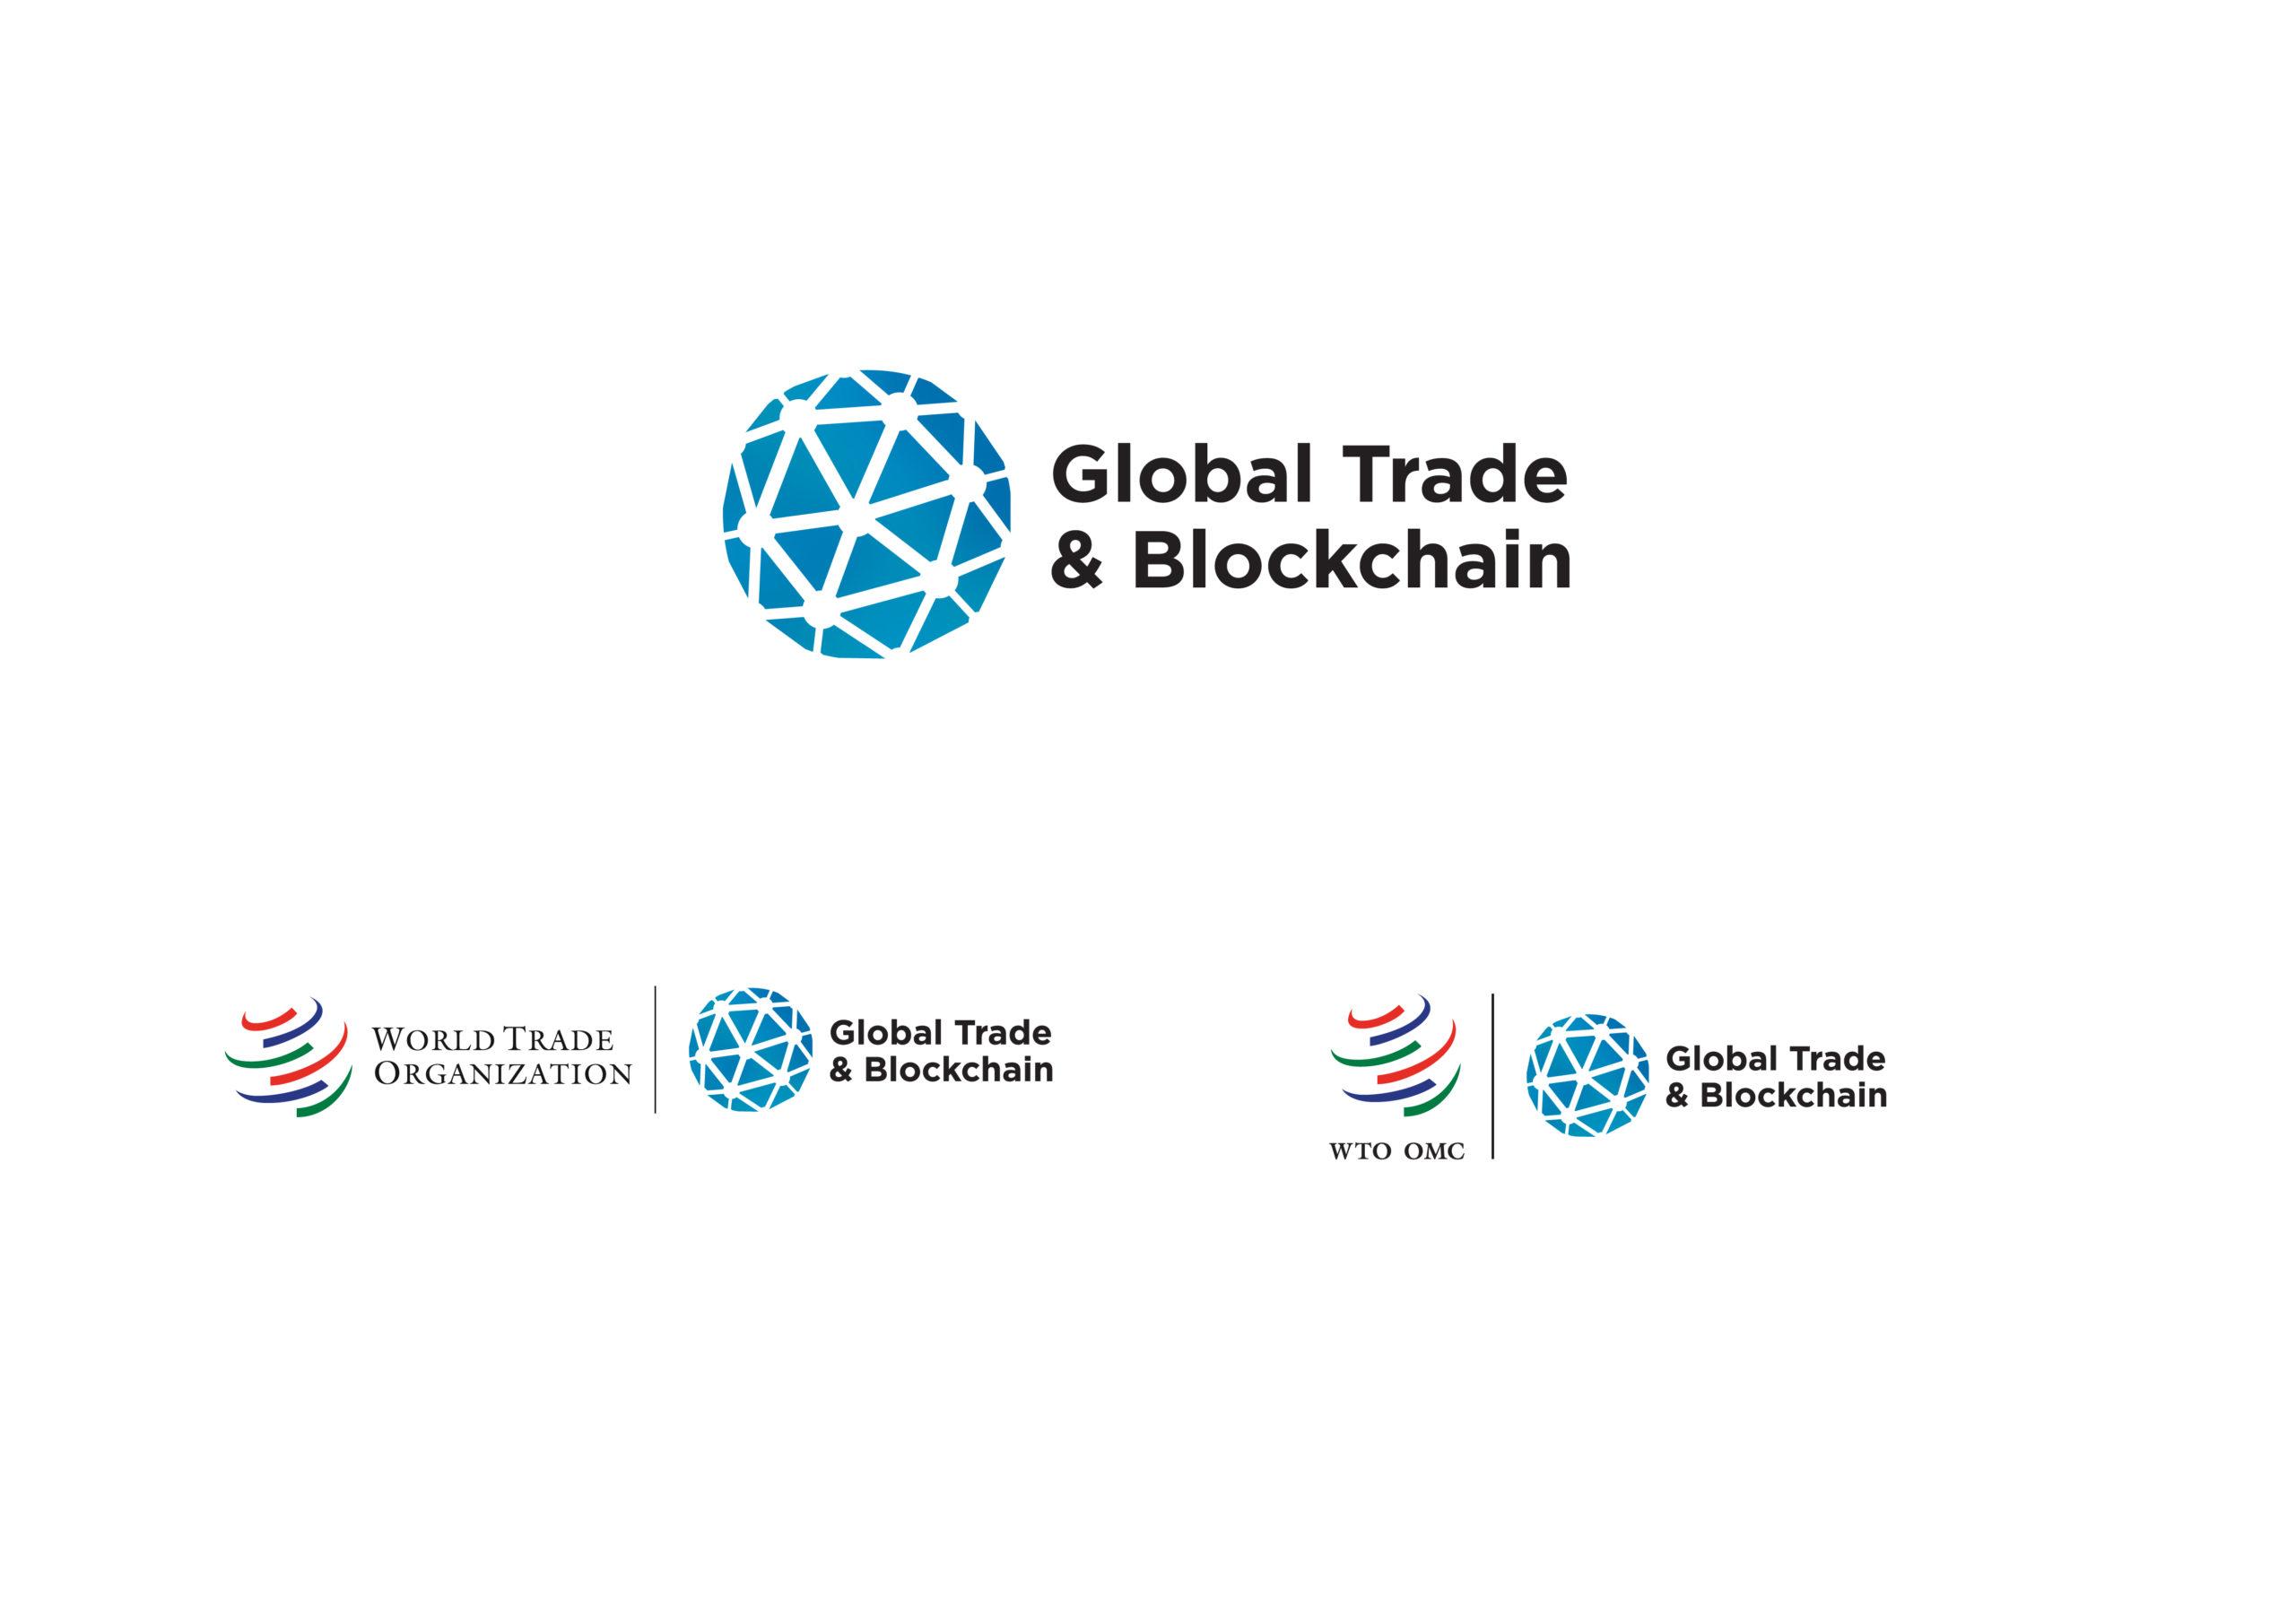 WTO Global Trade & Blockchain (Logo & Branding)